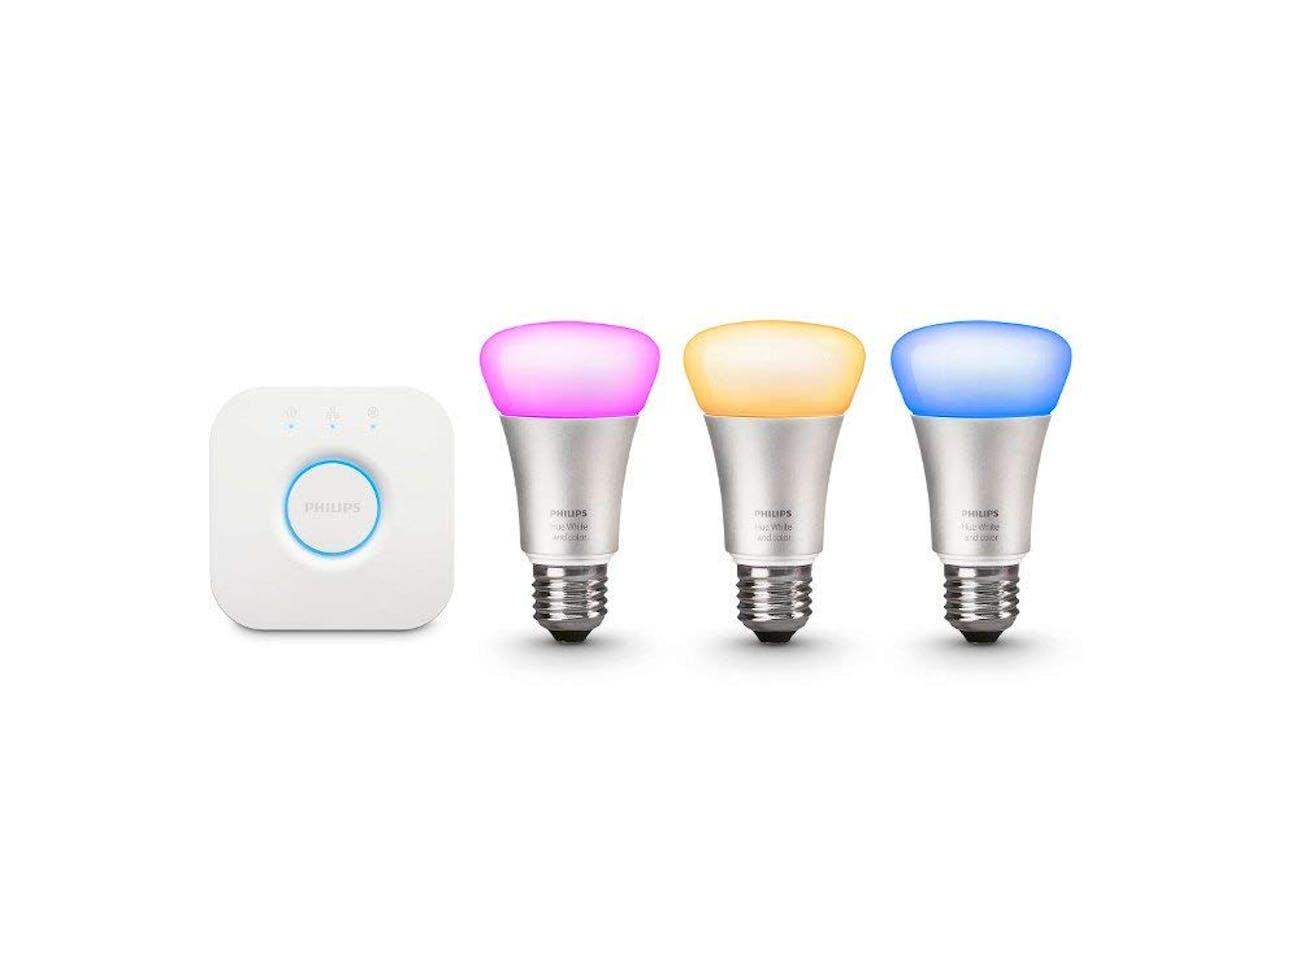 Philips Hue Smart Bulbs